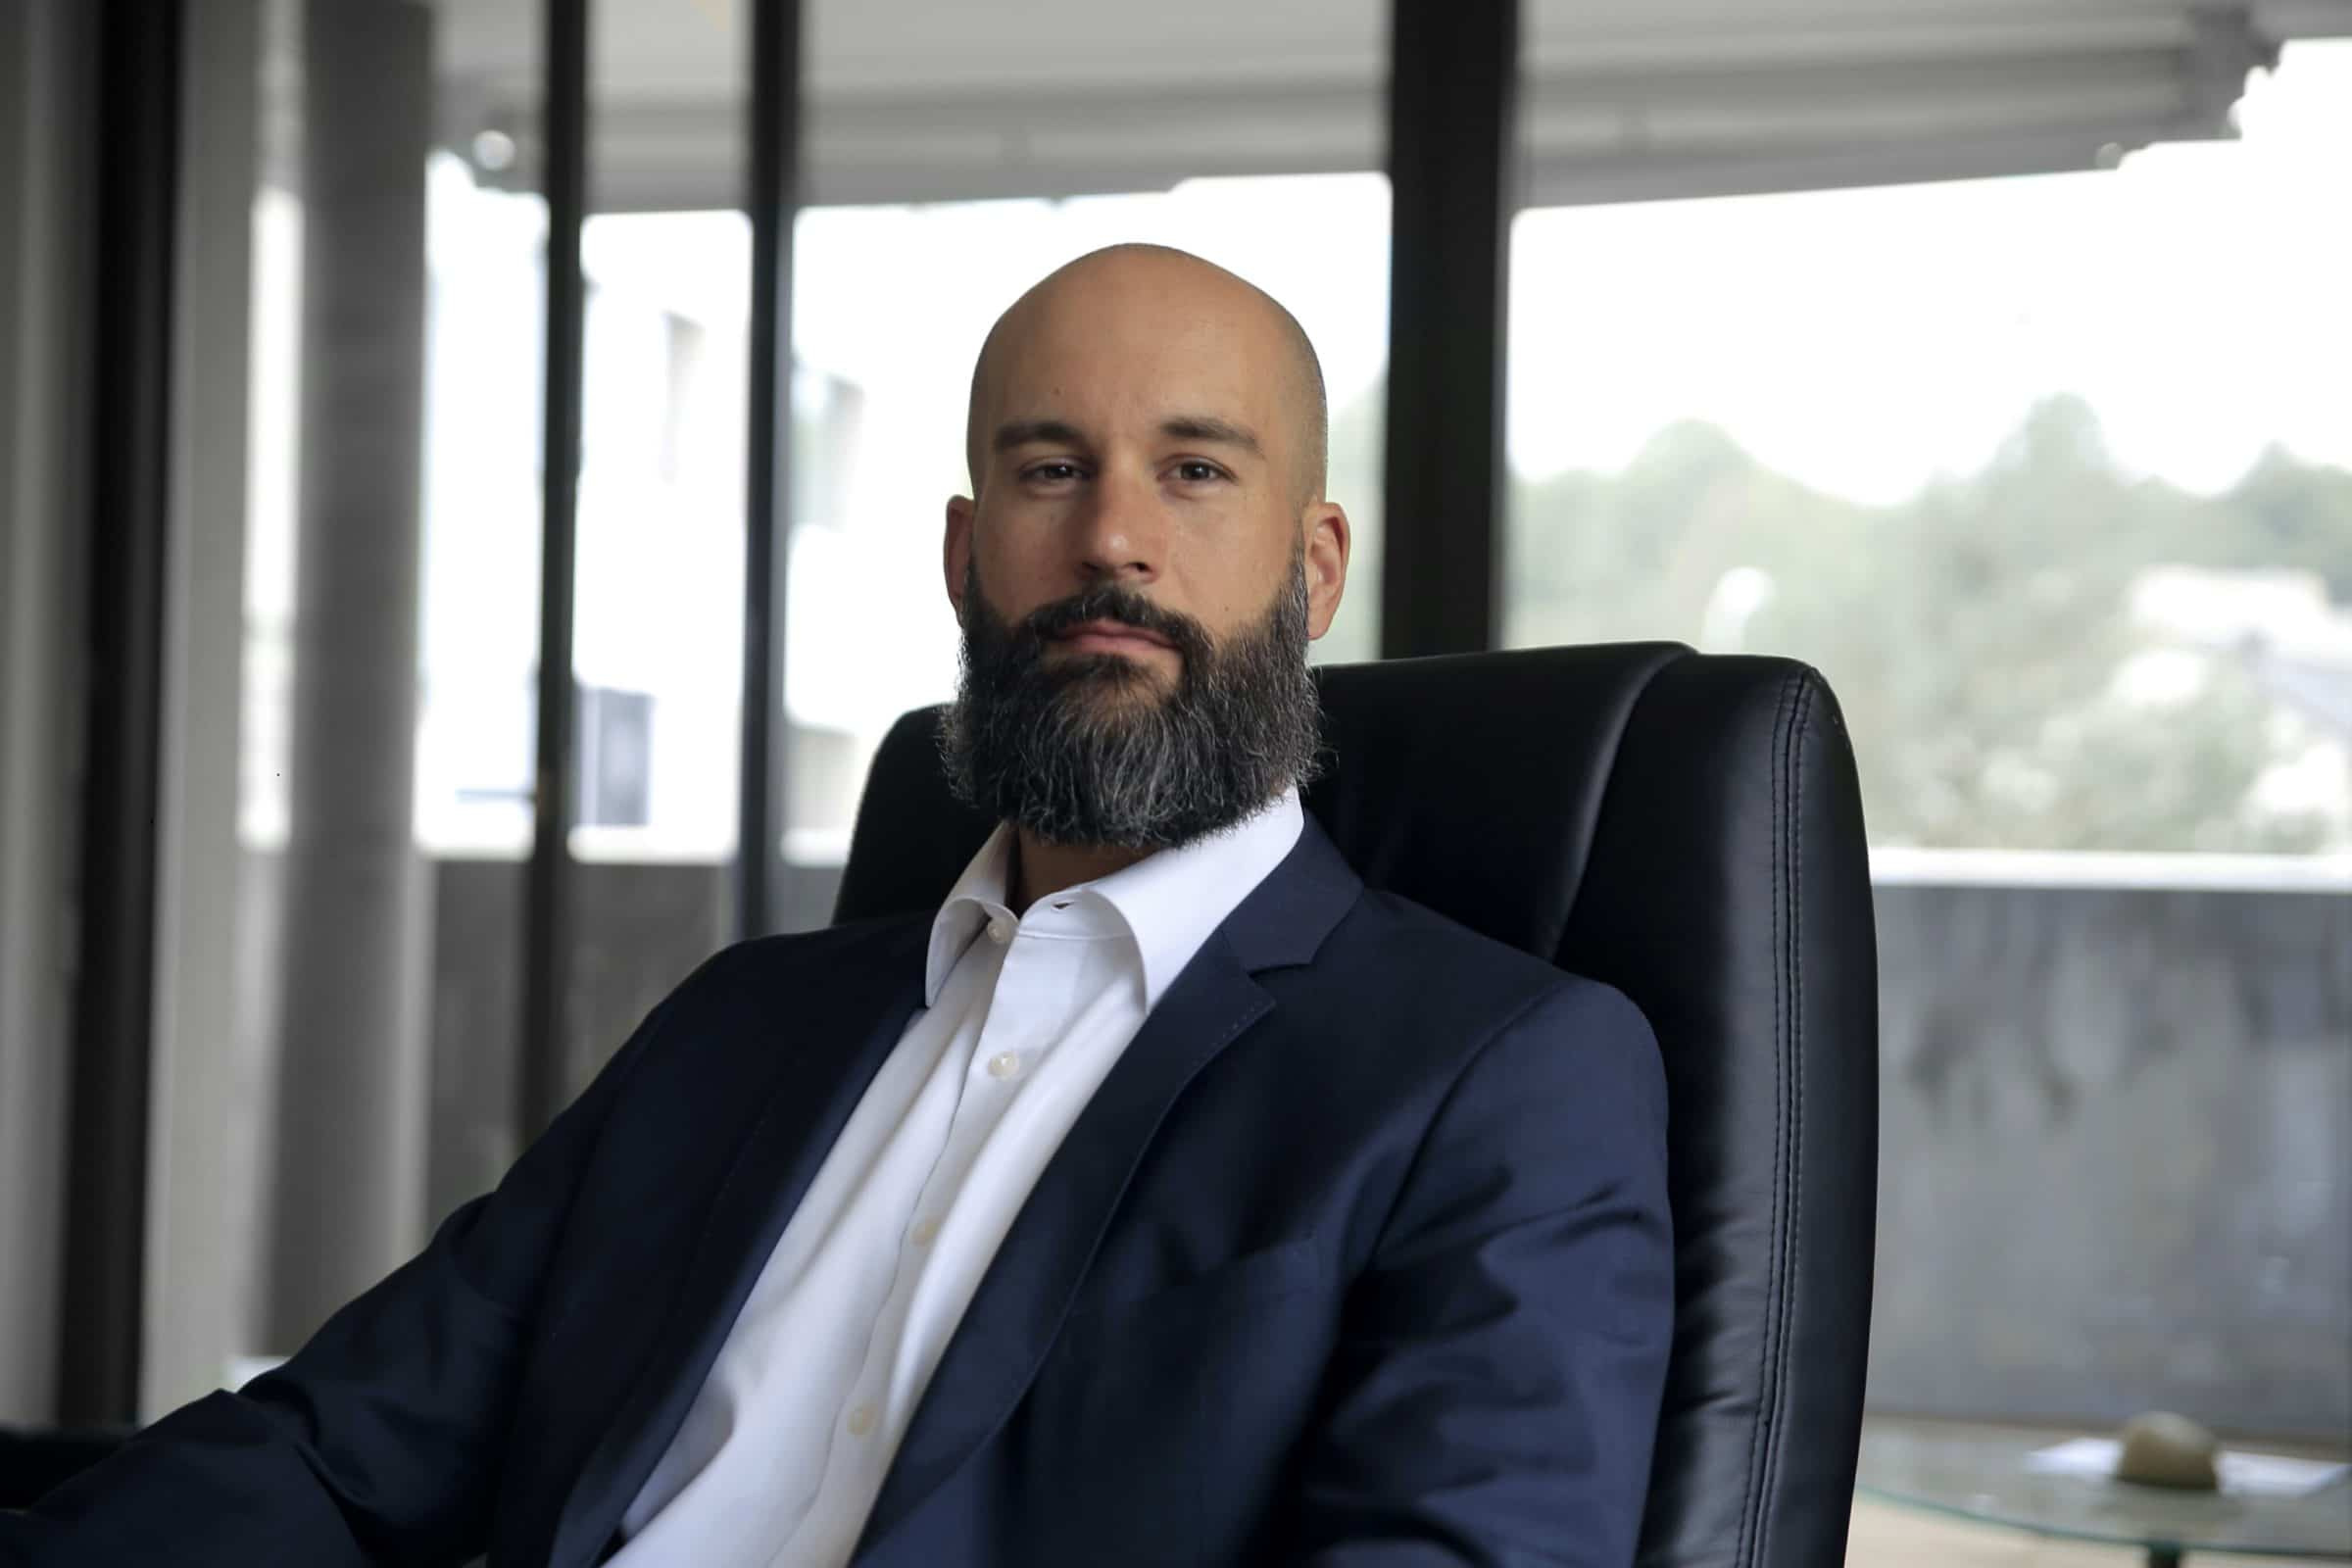 Marco S. Maffei, lic. oec. HSG, Founder & CEO